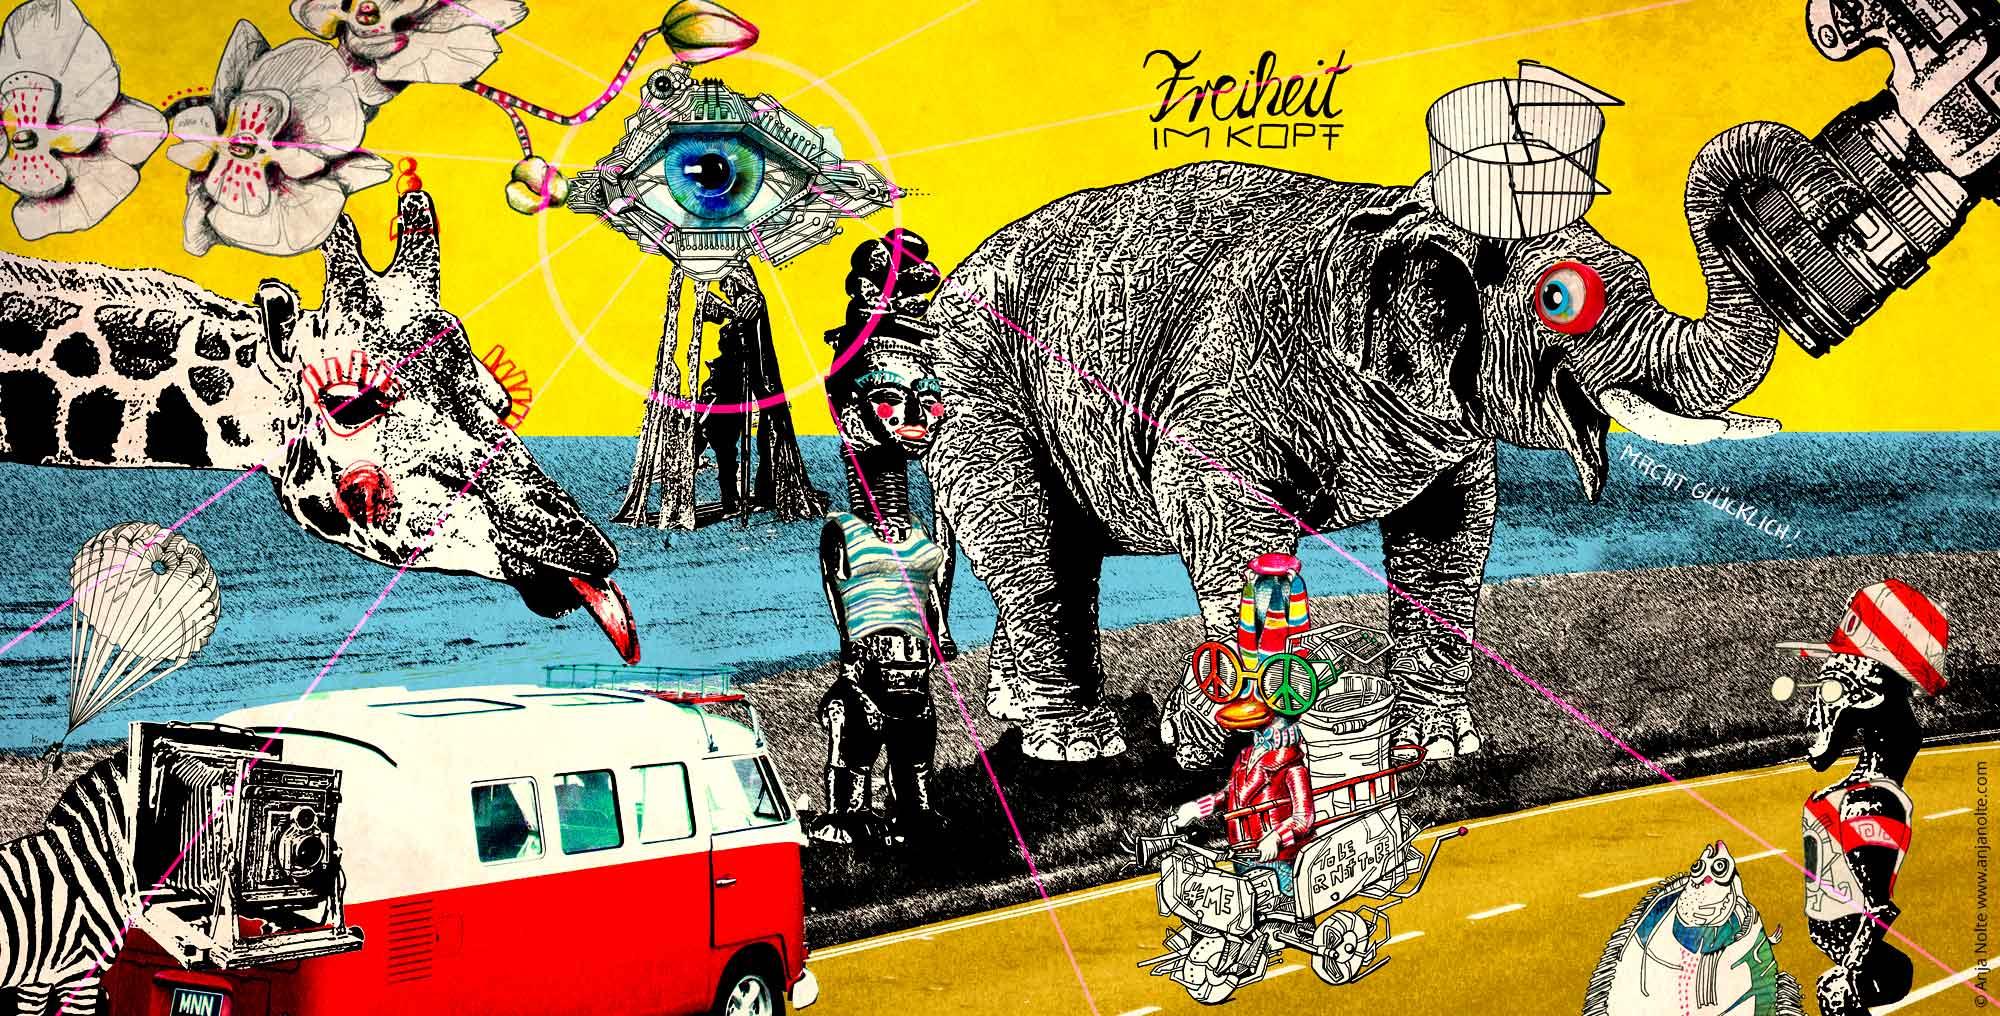 Illustartion zum Thema Sabbatical, Reisen, Afrika mit Giraffe, Elefant, Zebra mit einem Kamerakopf, Ente auf einem Mofa, Afrika Kultfiguren...